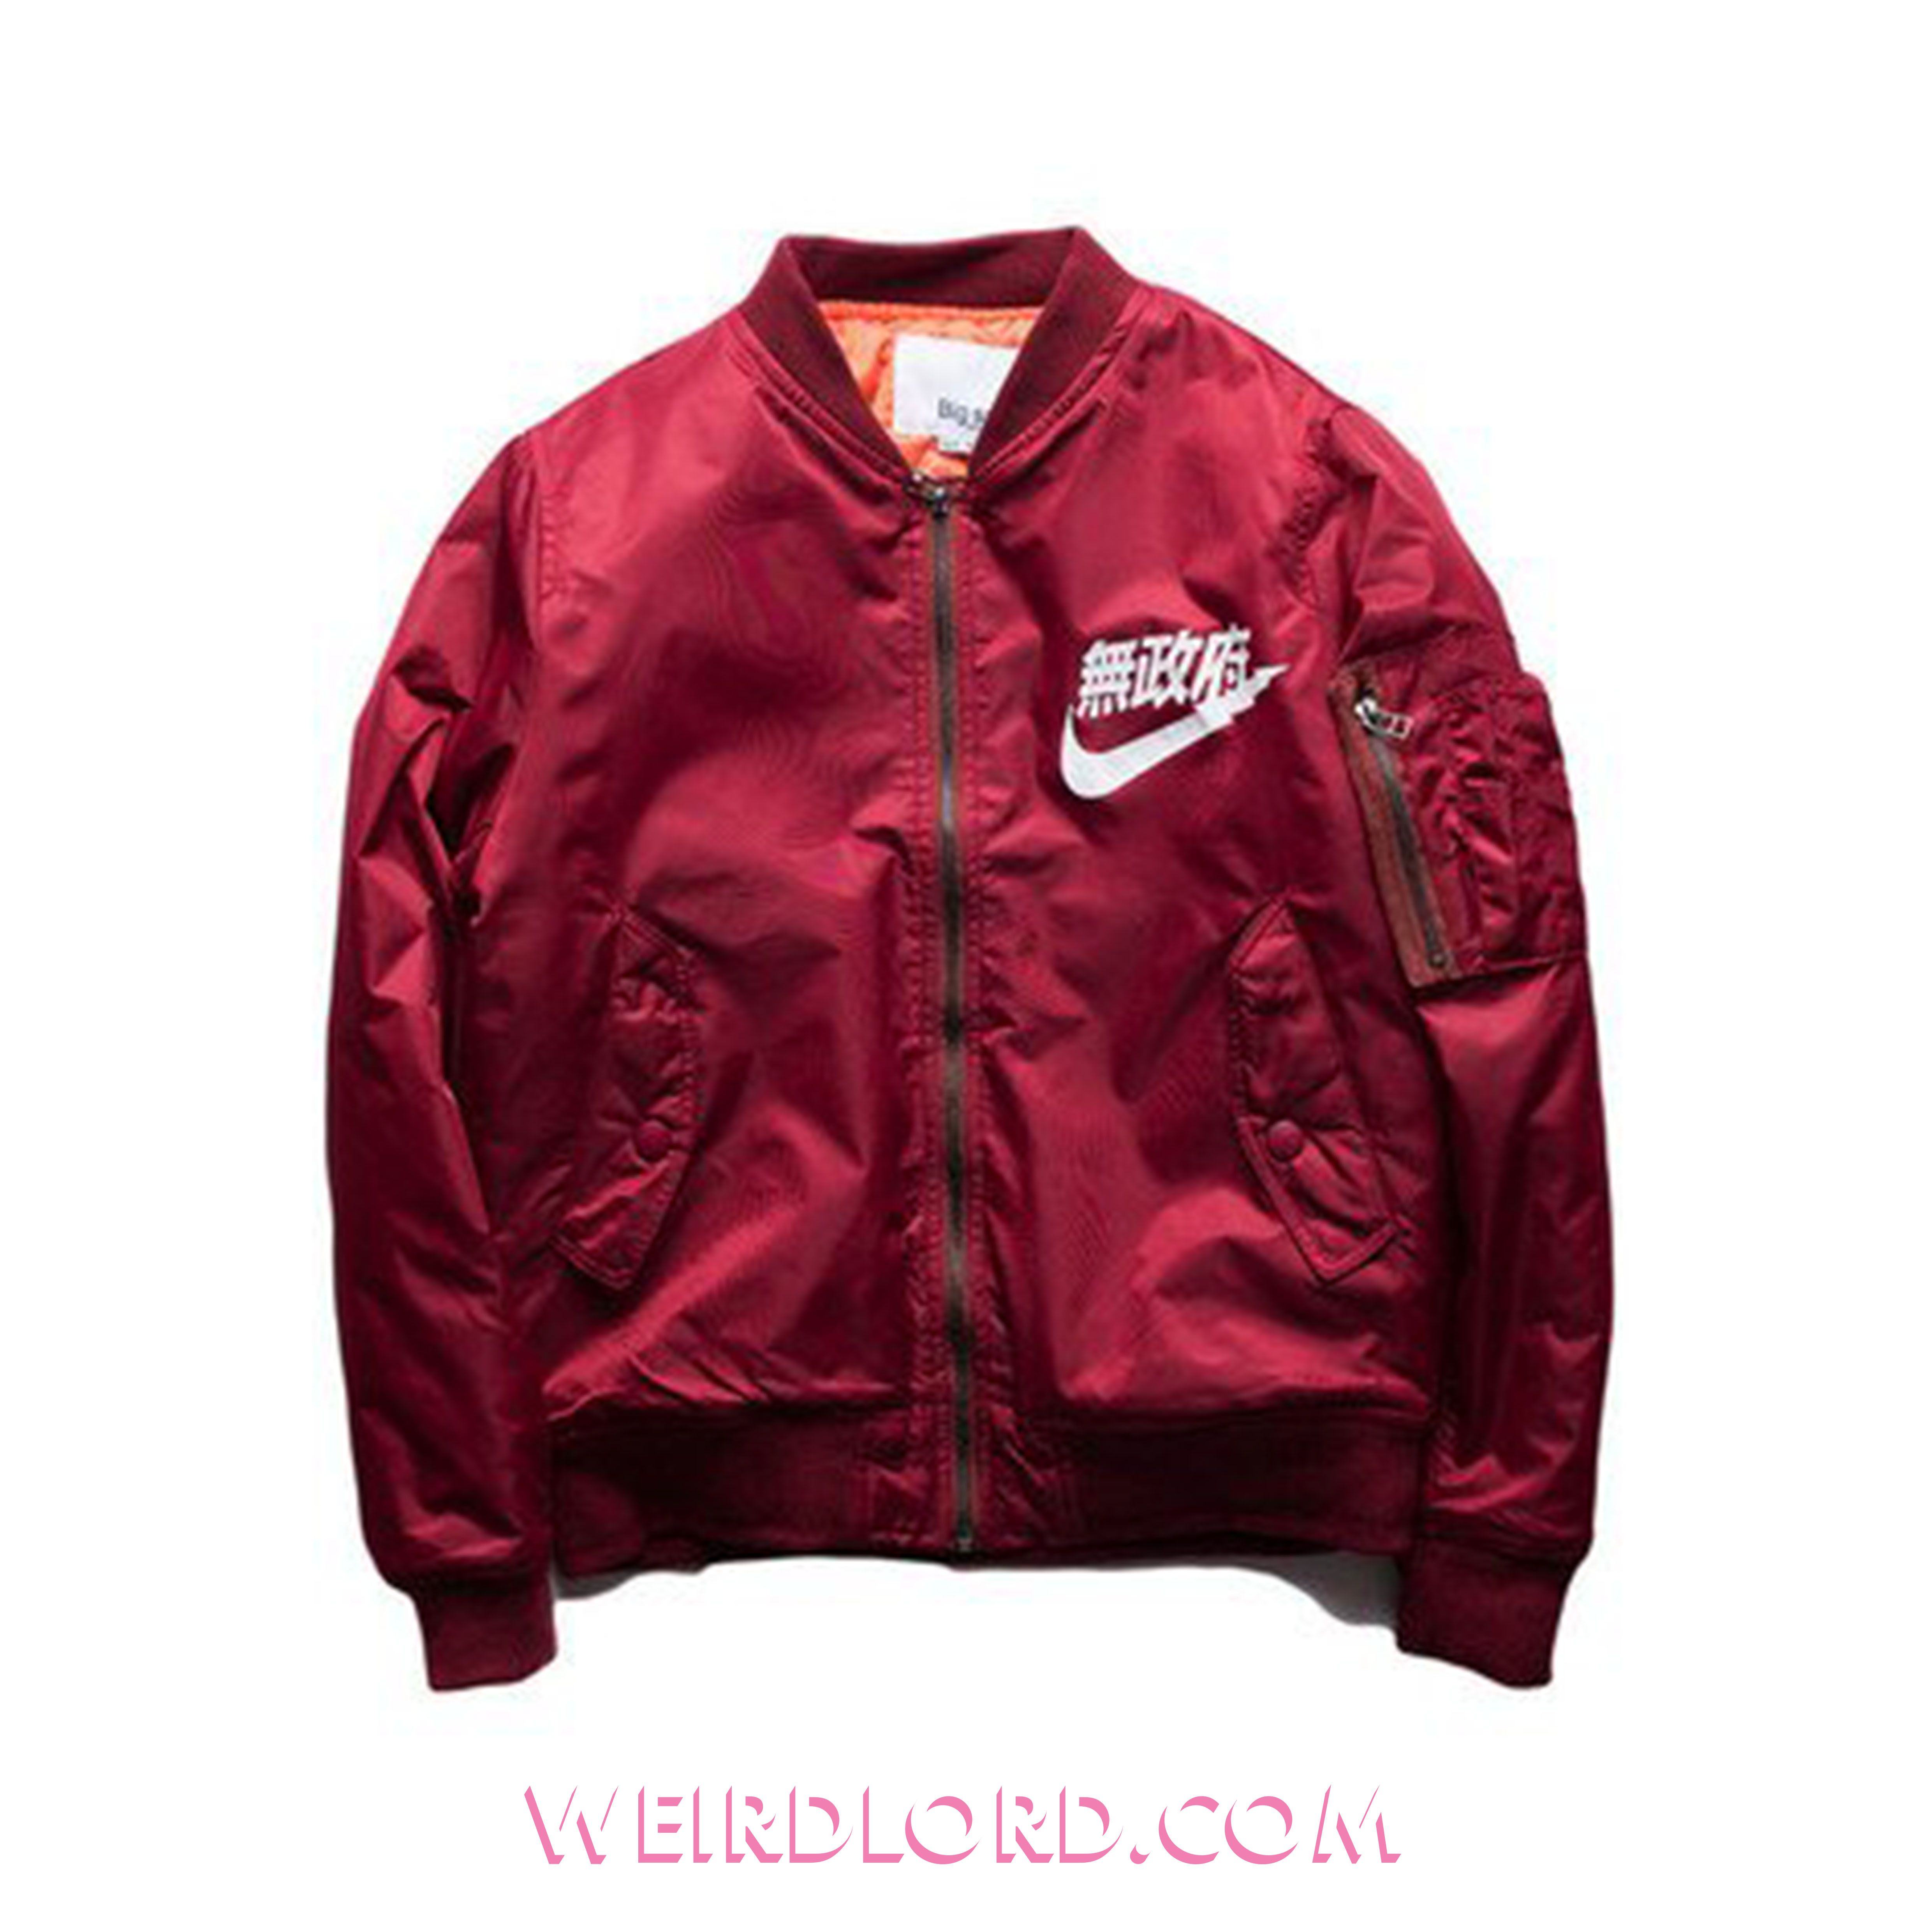 Anarchy Bomber Jacket Red Bomber Jacket Bomber Jacket Men Nike Bomber Jacket [ 4961 x 4961 Pixel ]